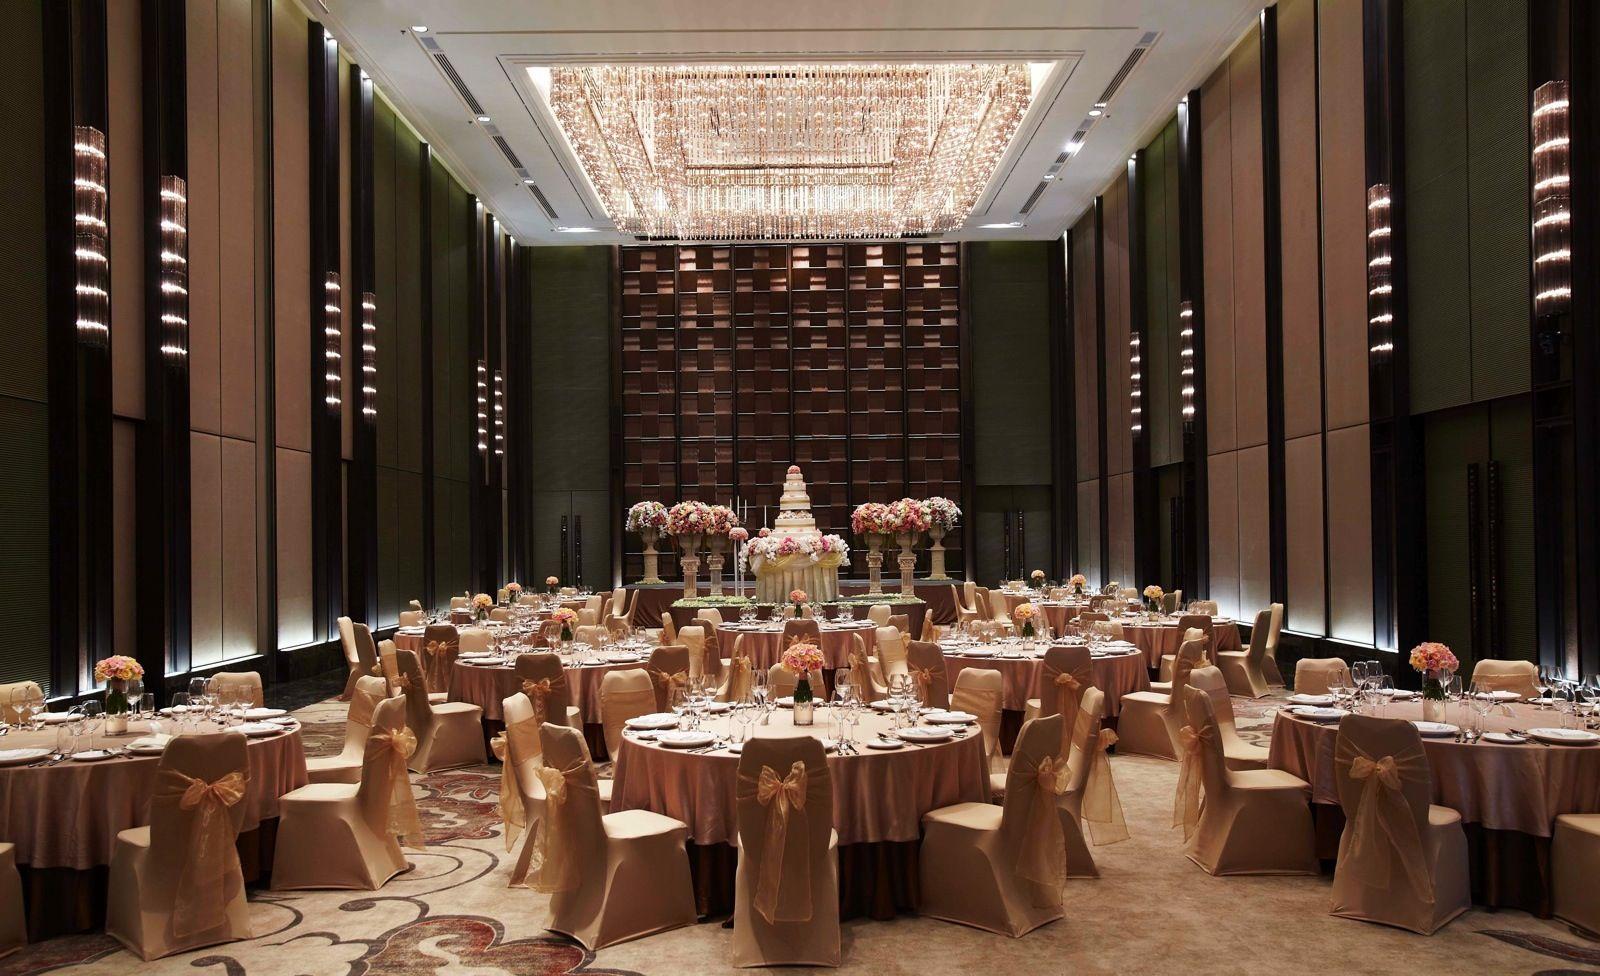 grand ballroom theatre idhotel pinterest luxury